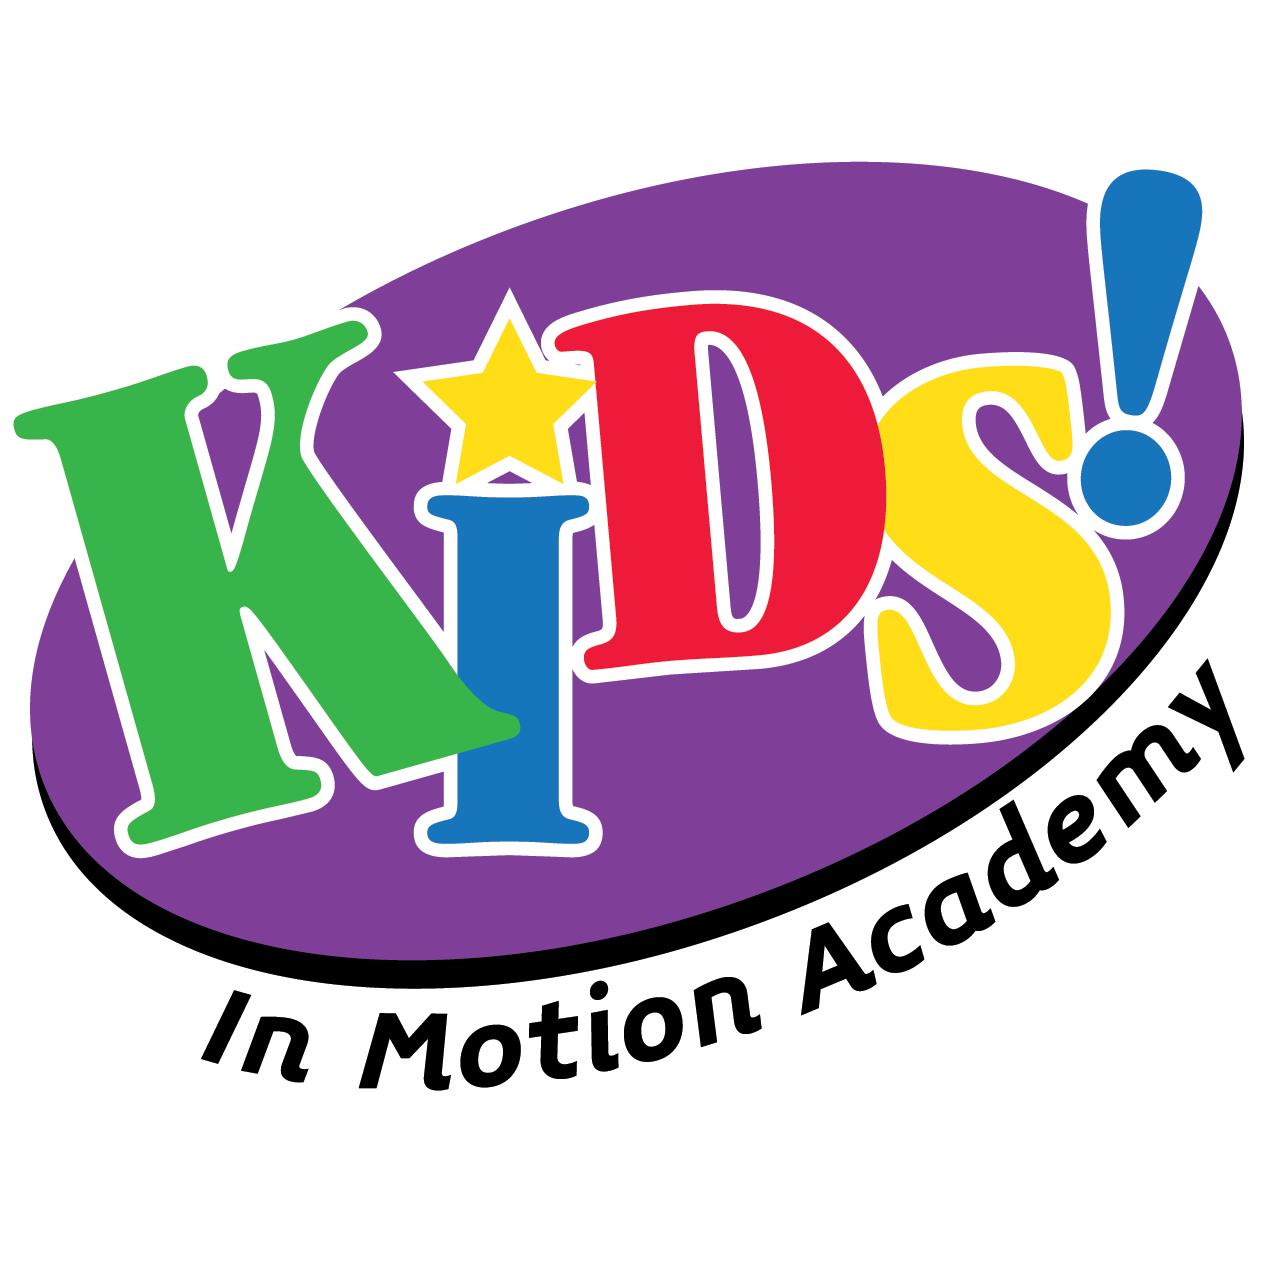 Kids In Motion Academy - Broken Arrow, OK - Child Care